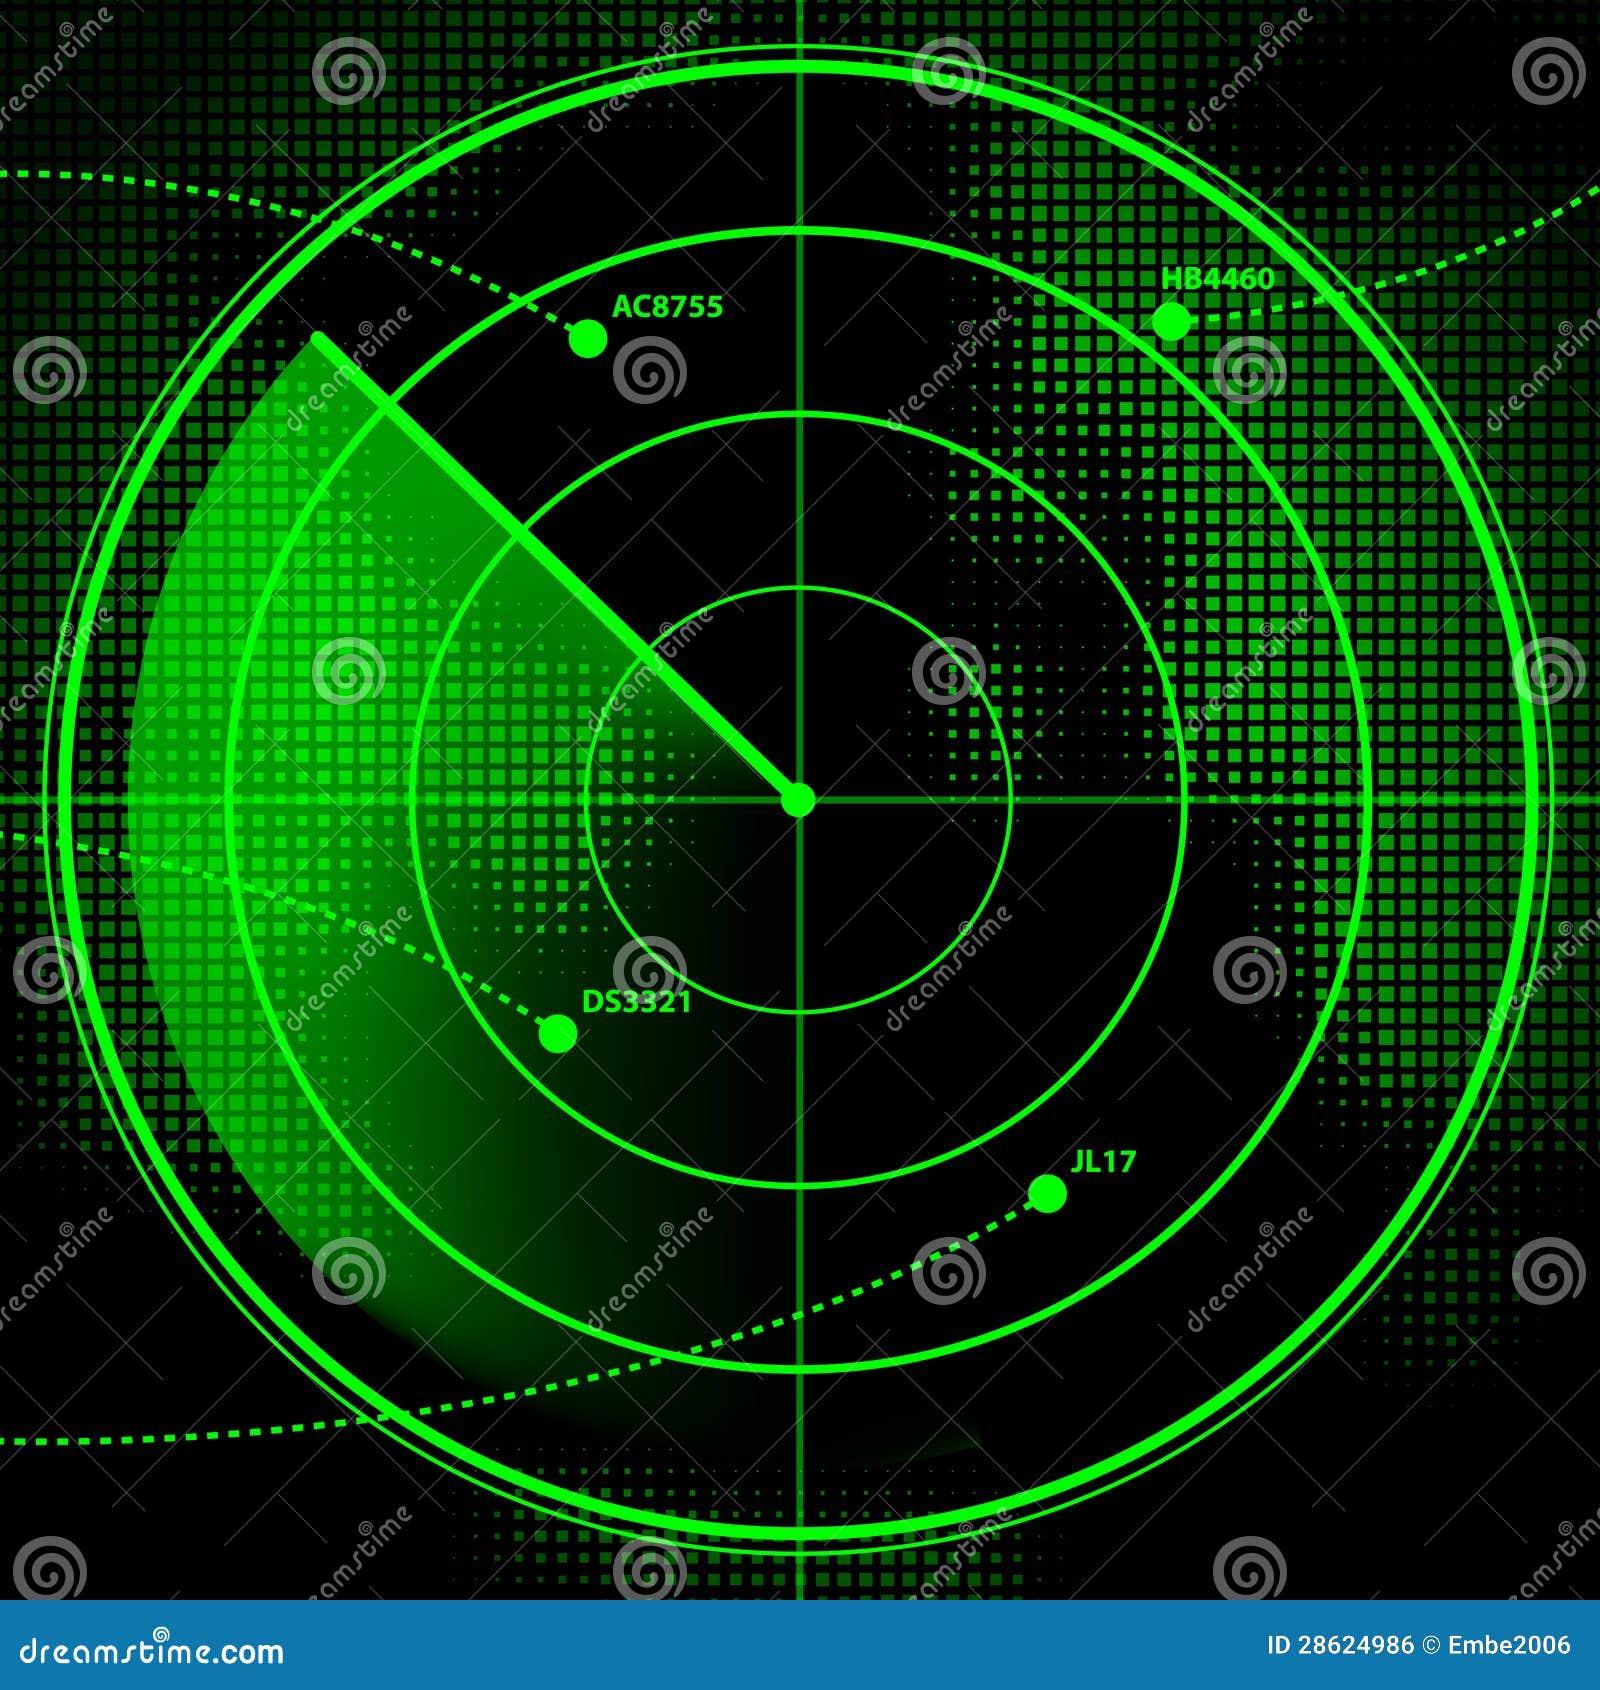 Radar Screen Royalty Free Stock Image Image 28624986